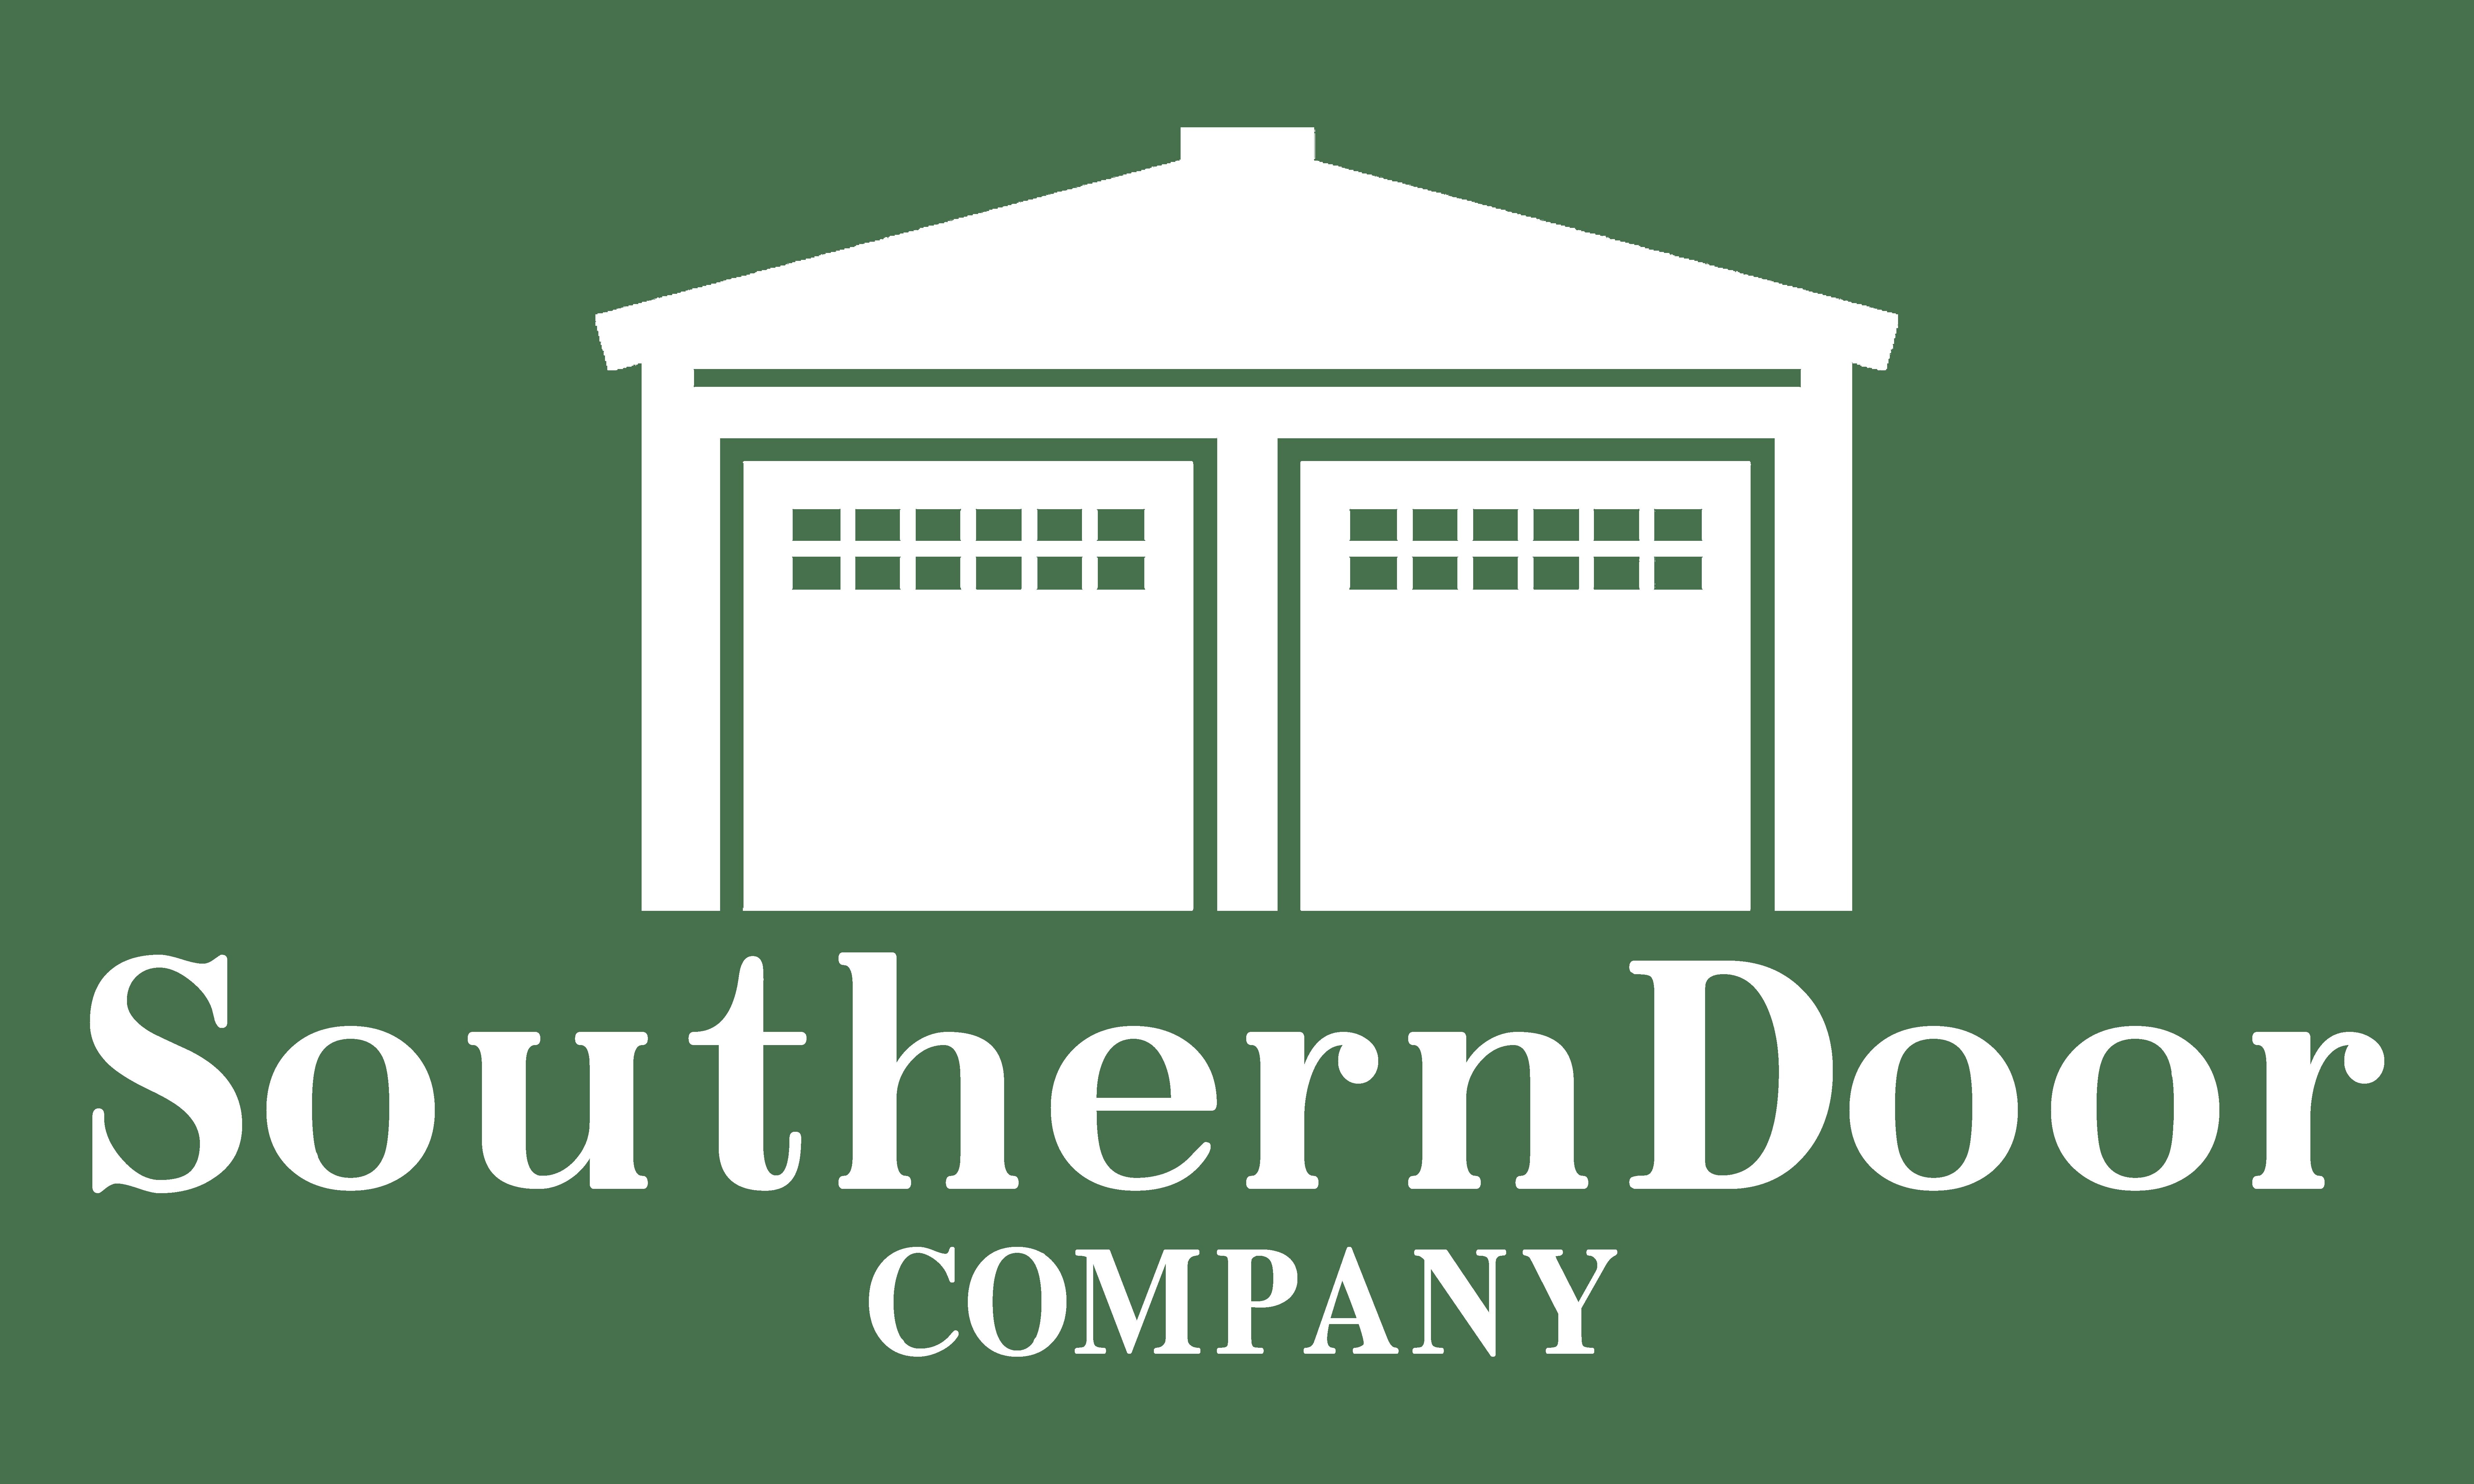 Southern Door Company